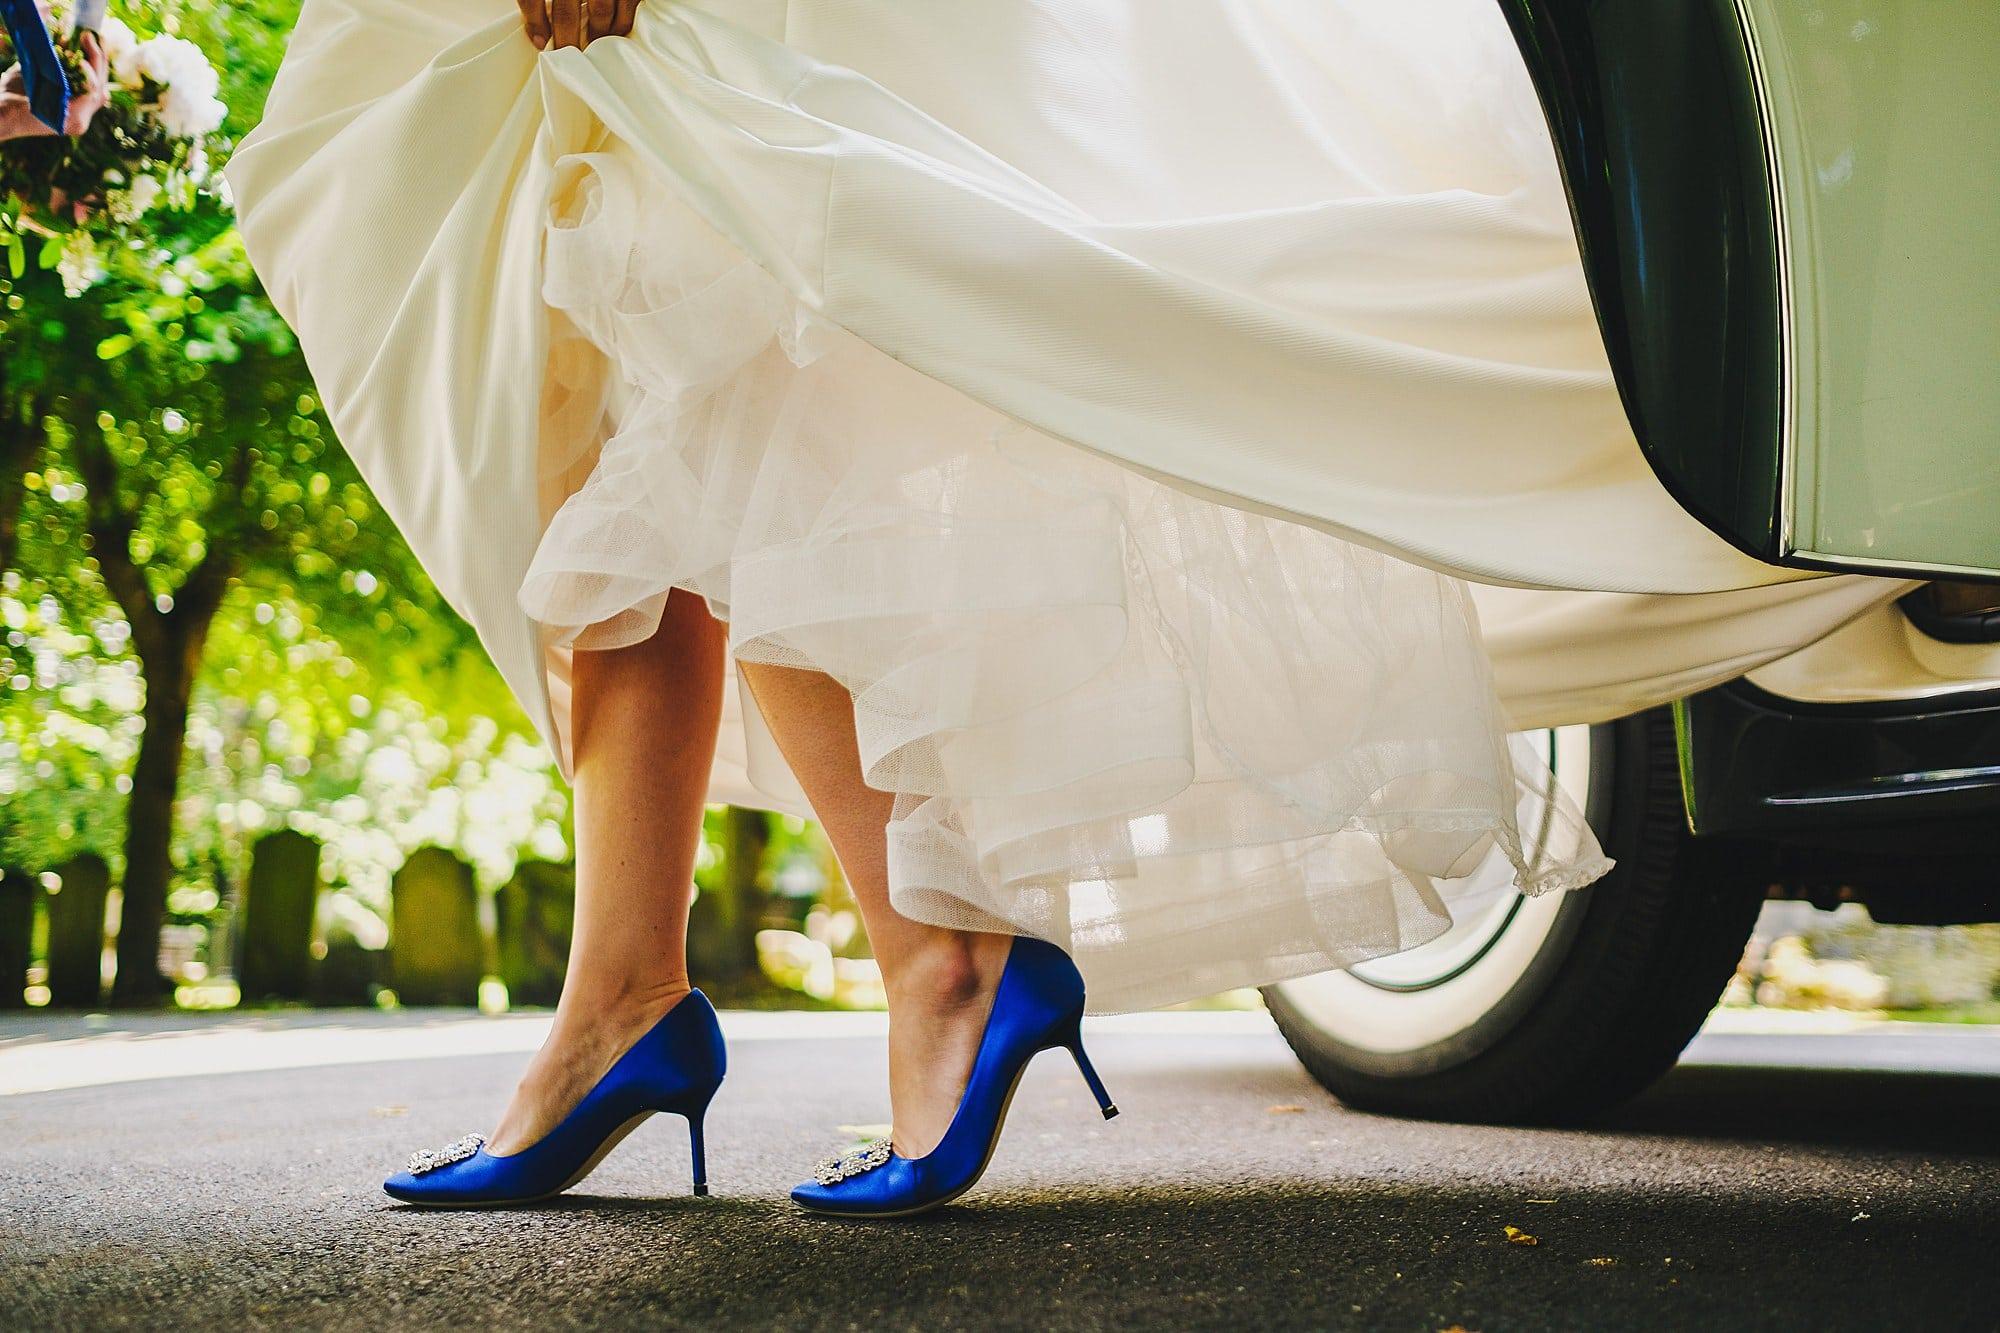 bride wearing Manolo blahnik shoes getting out of rolls Royce